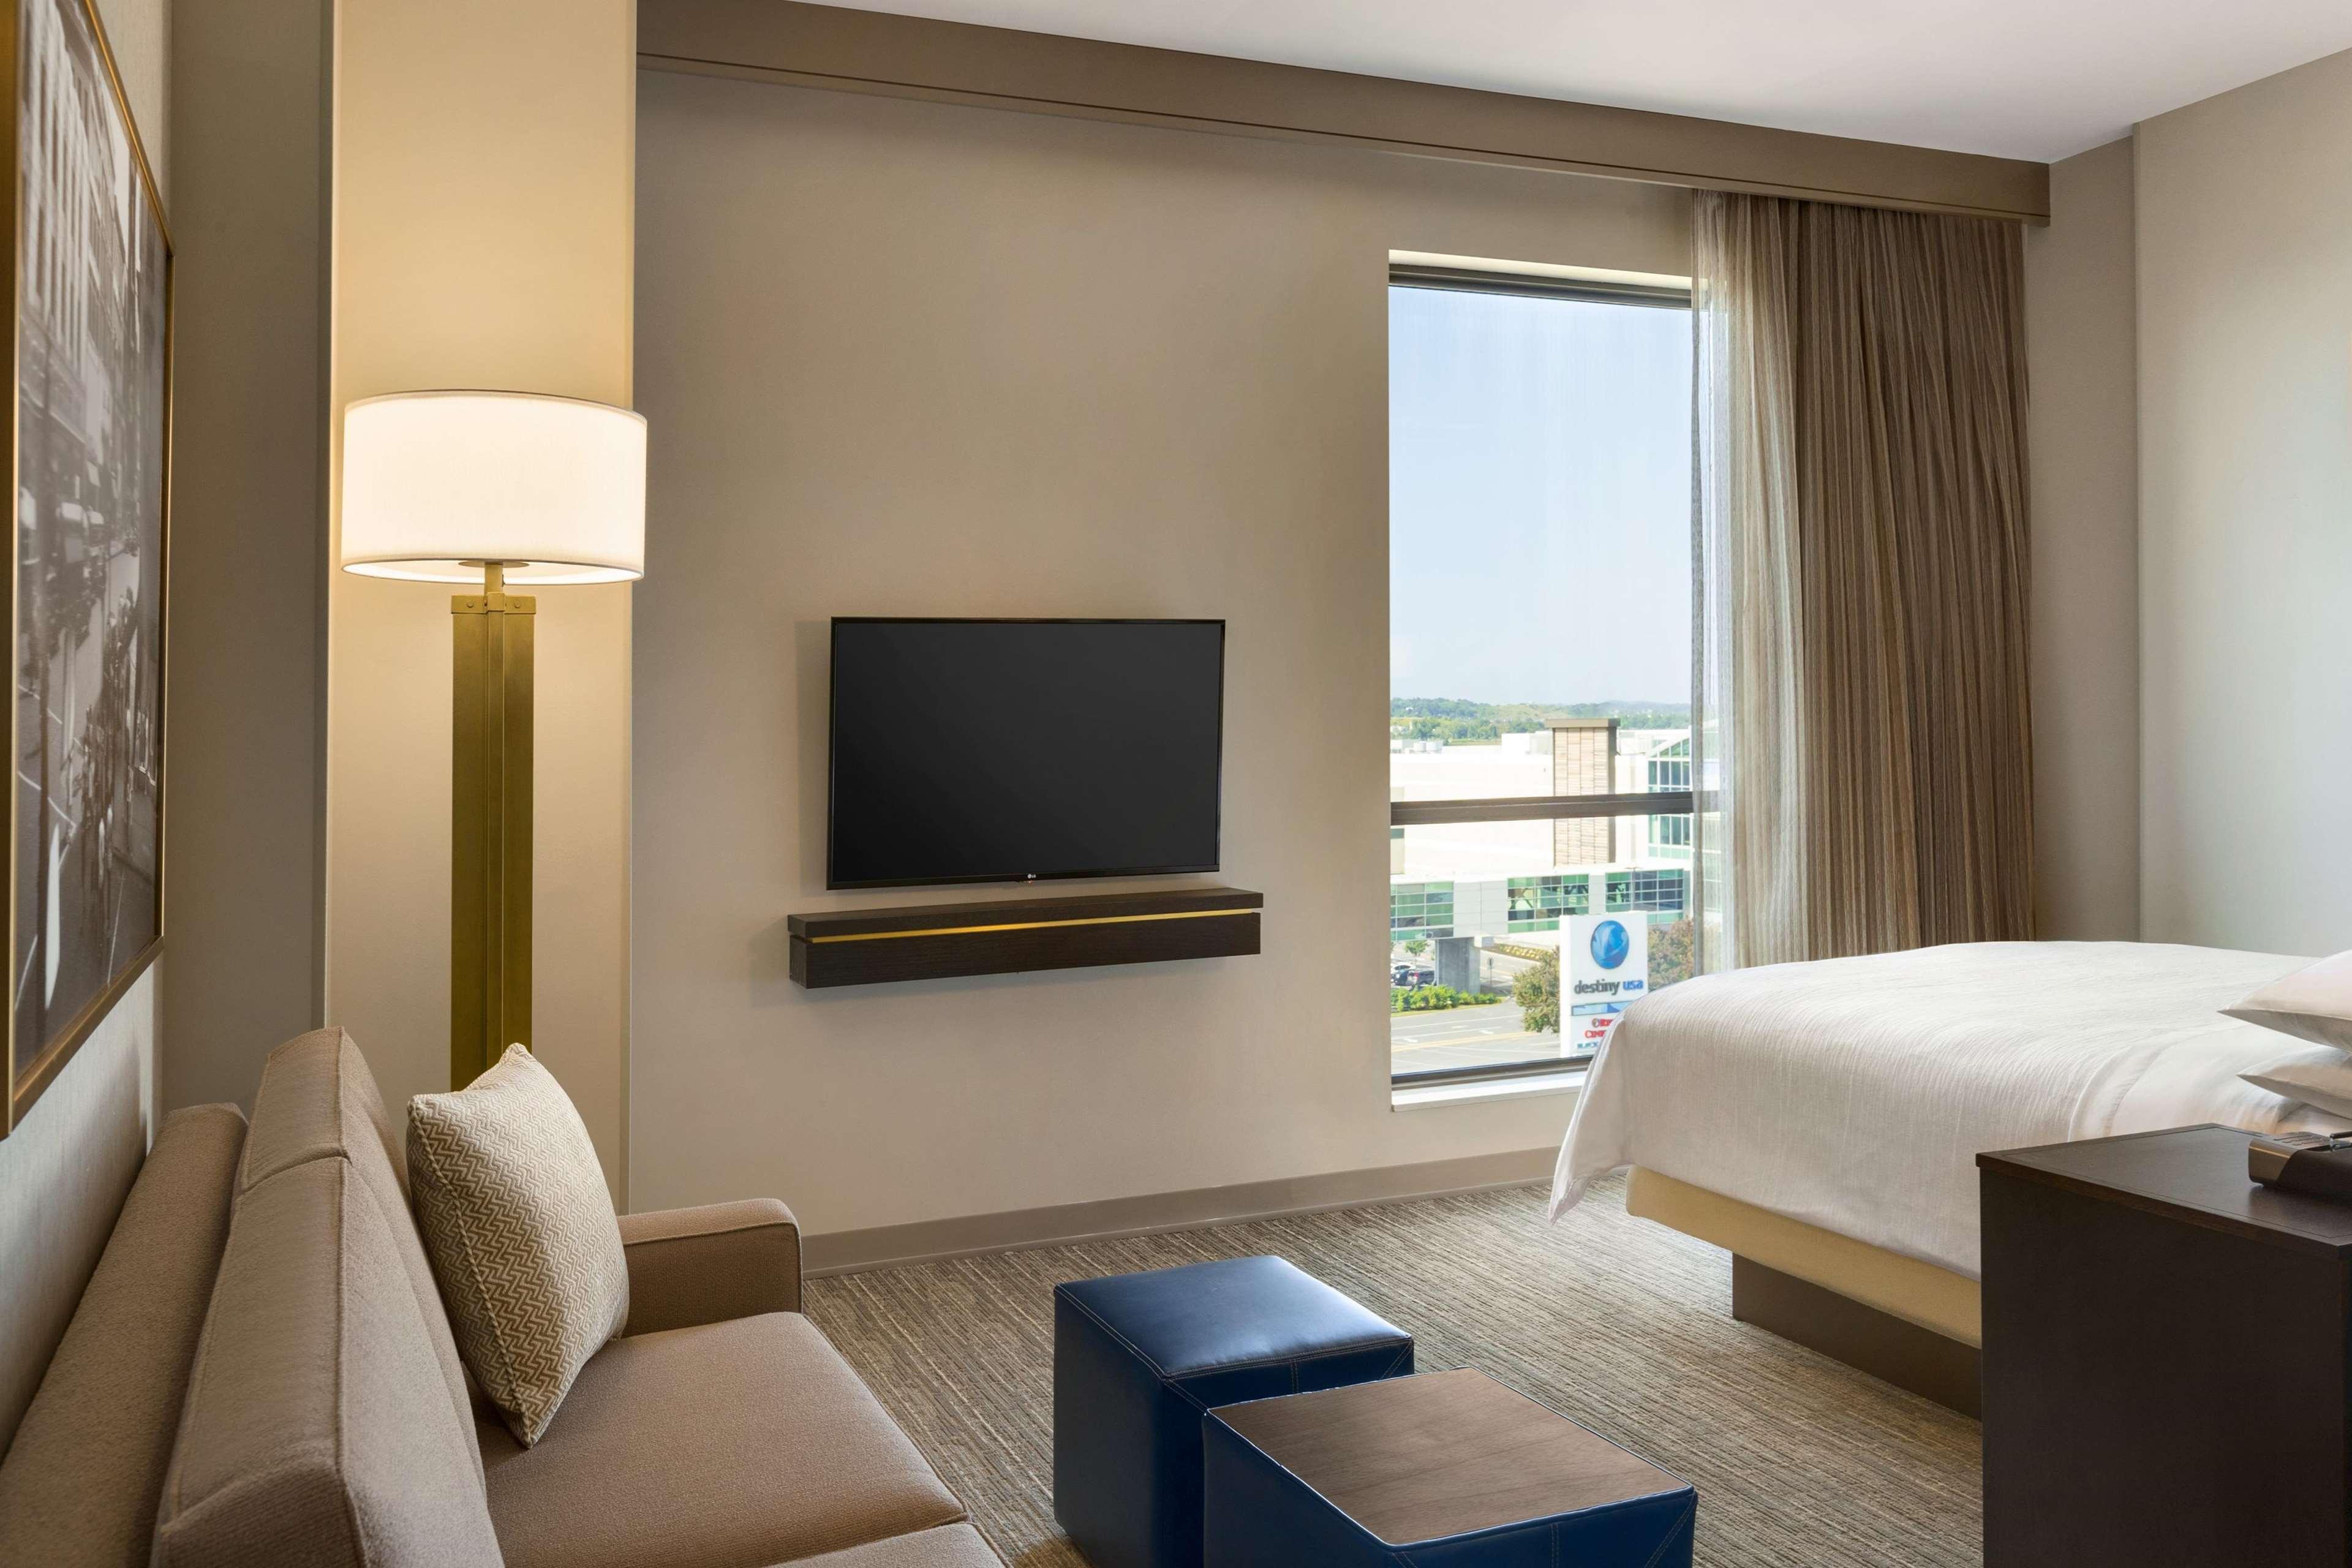 Embassy Suites by Hilton Syracuse Destiny USA image 18